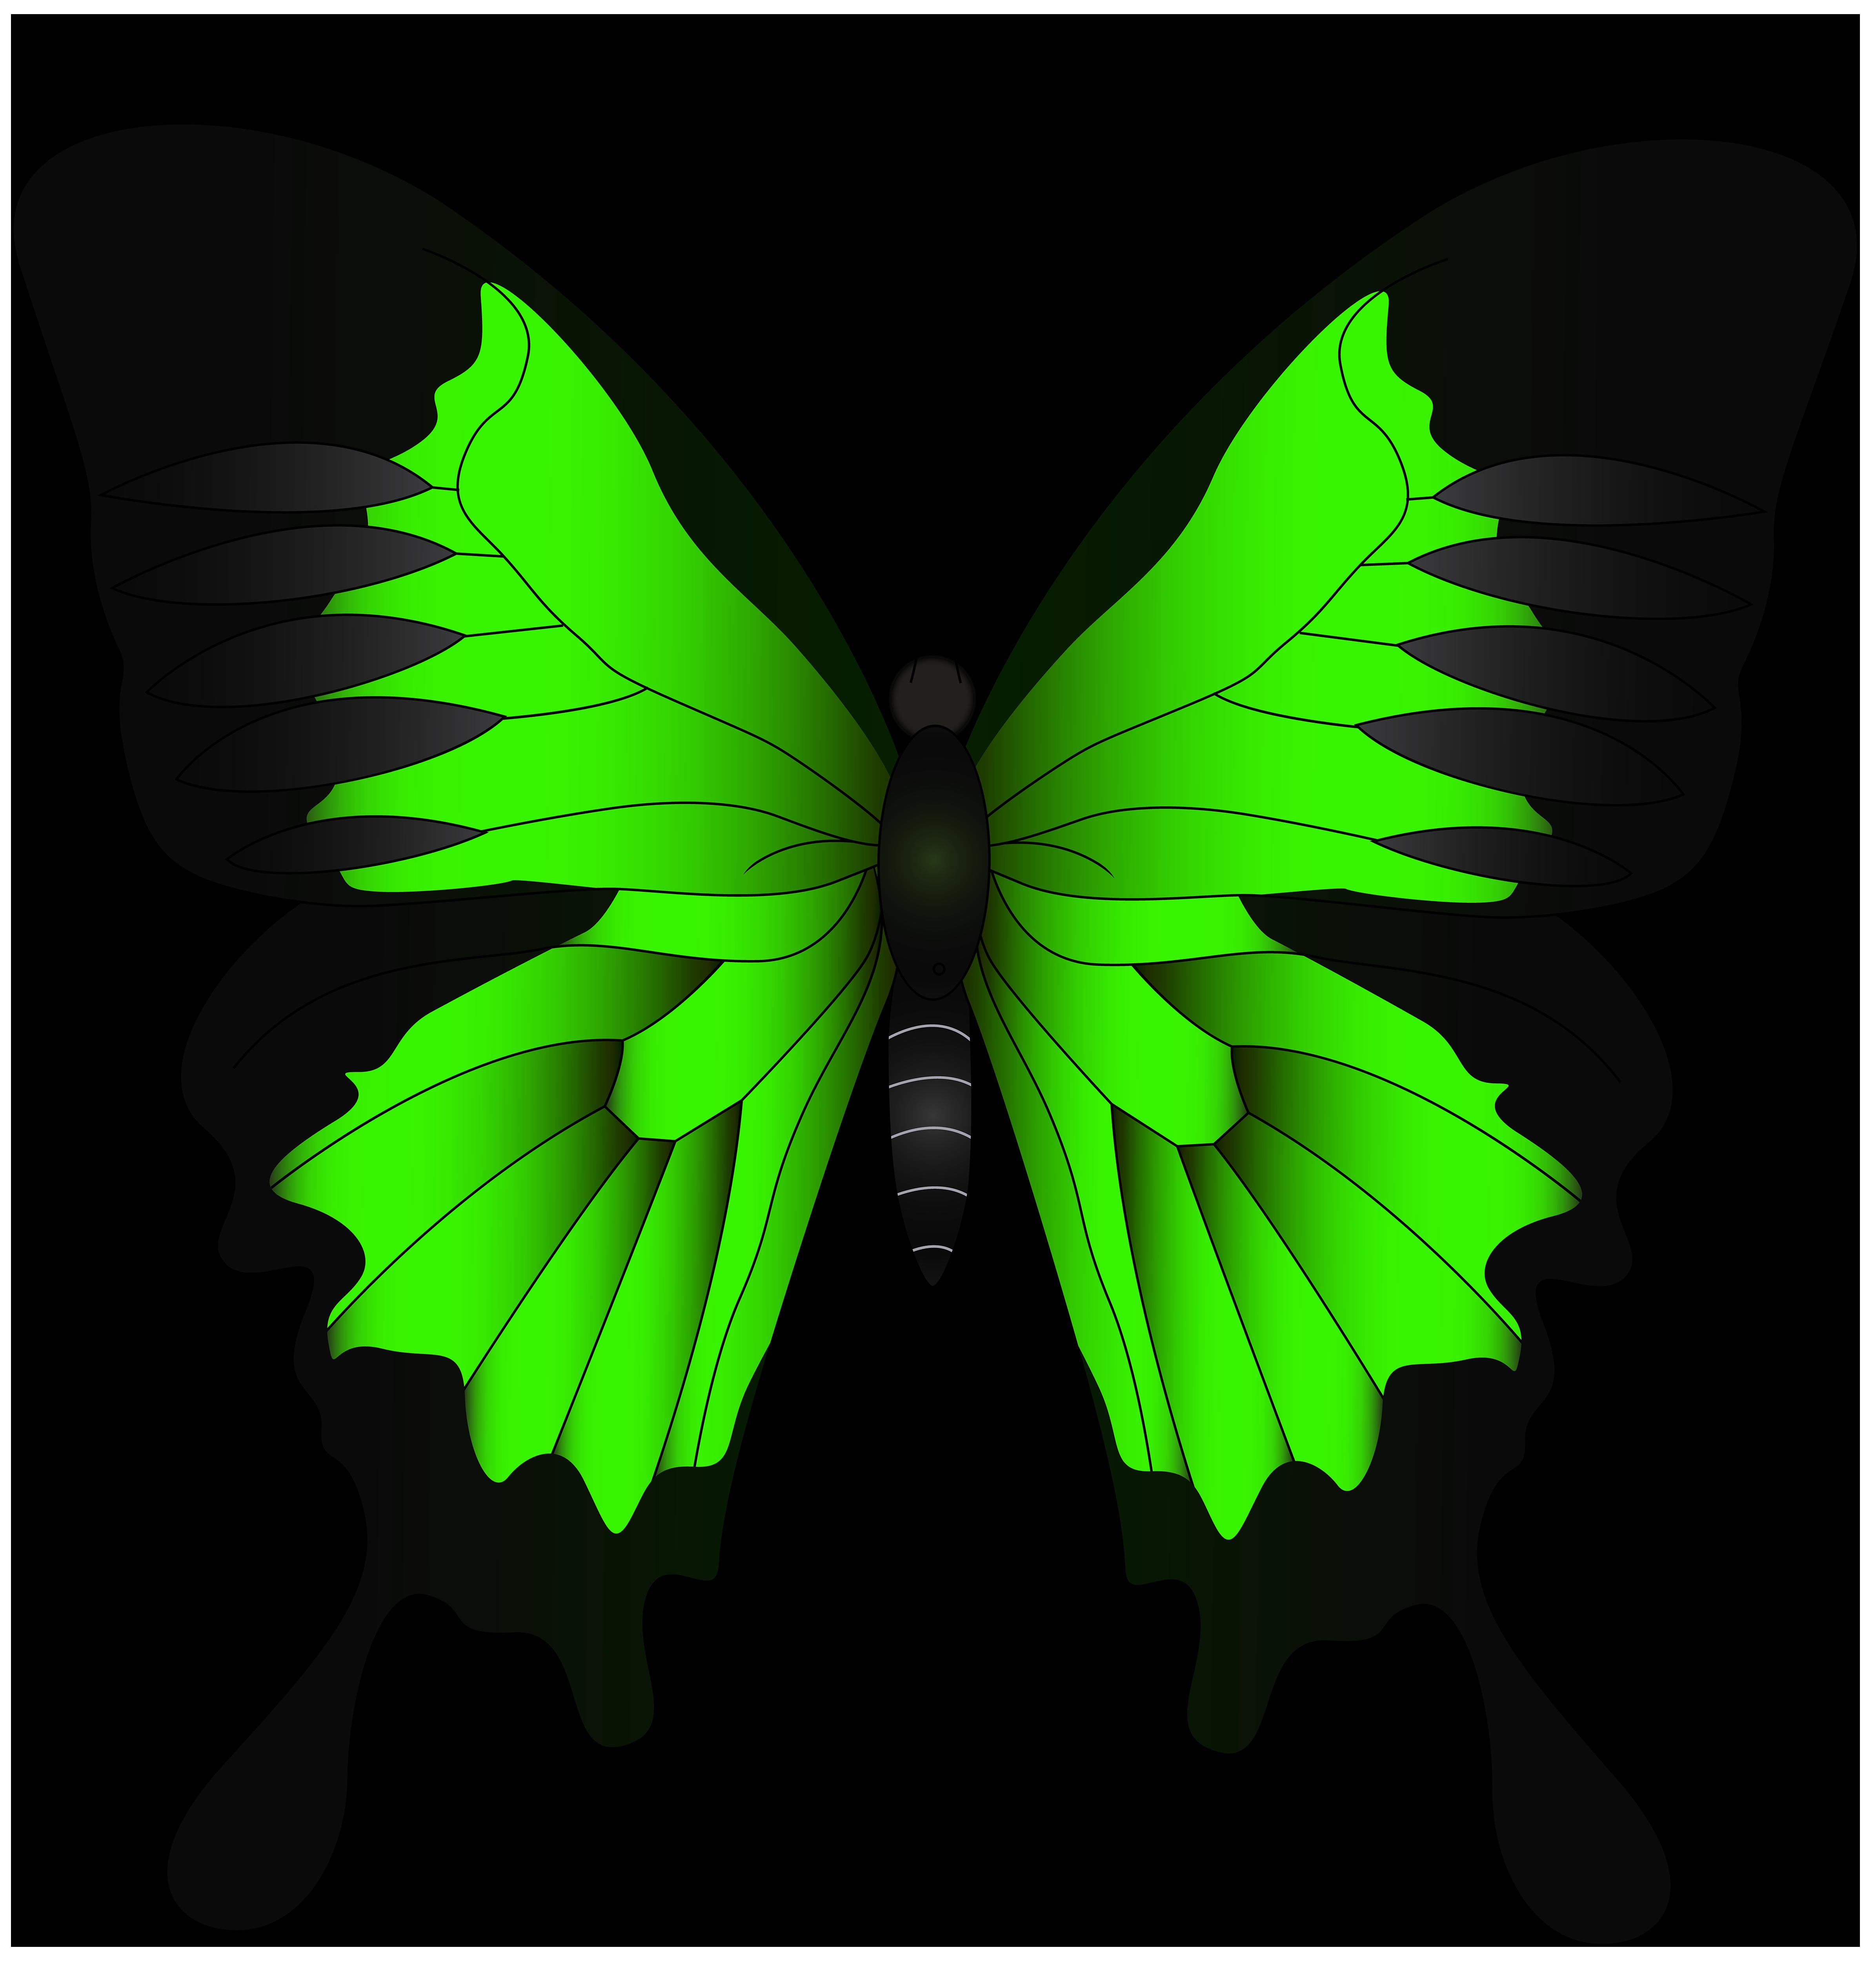 Png clip art image. Butterfly clipart light green